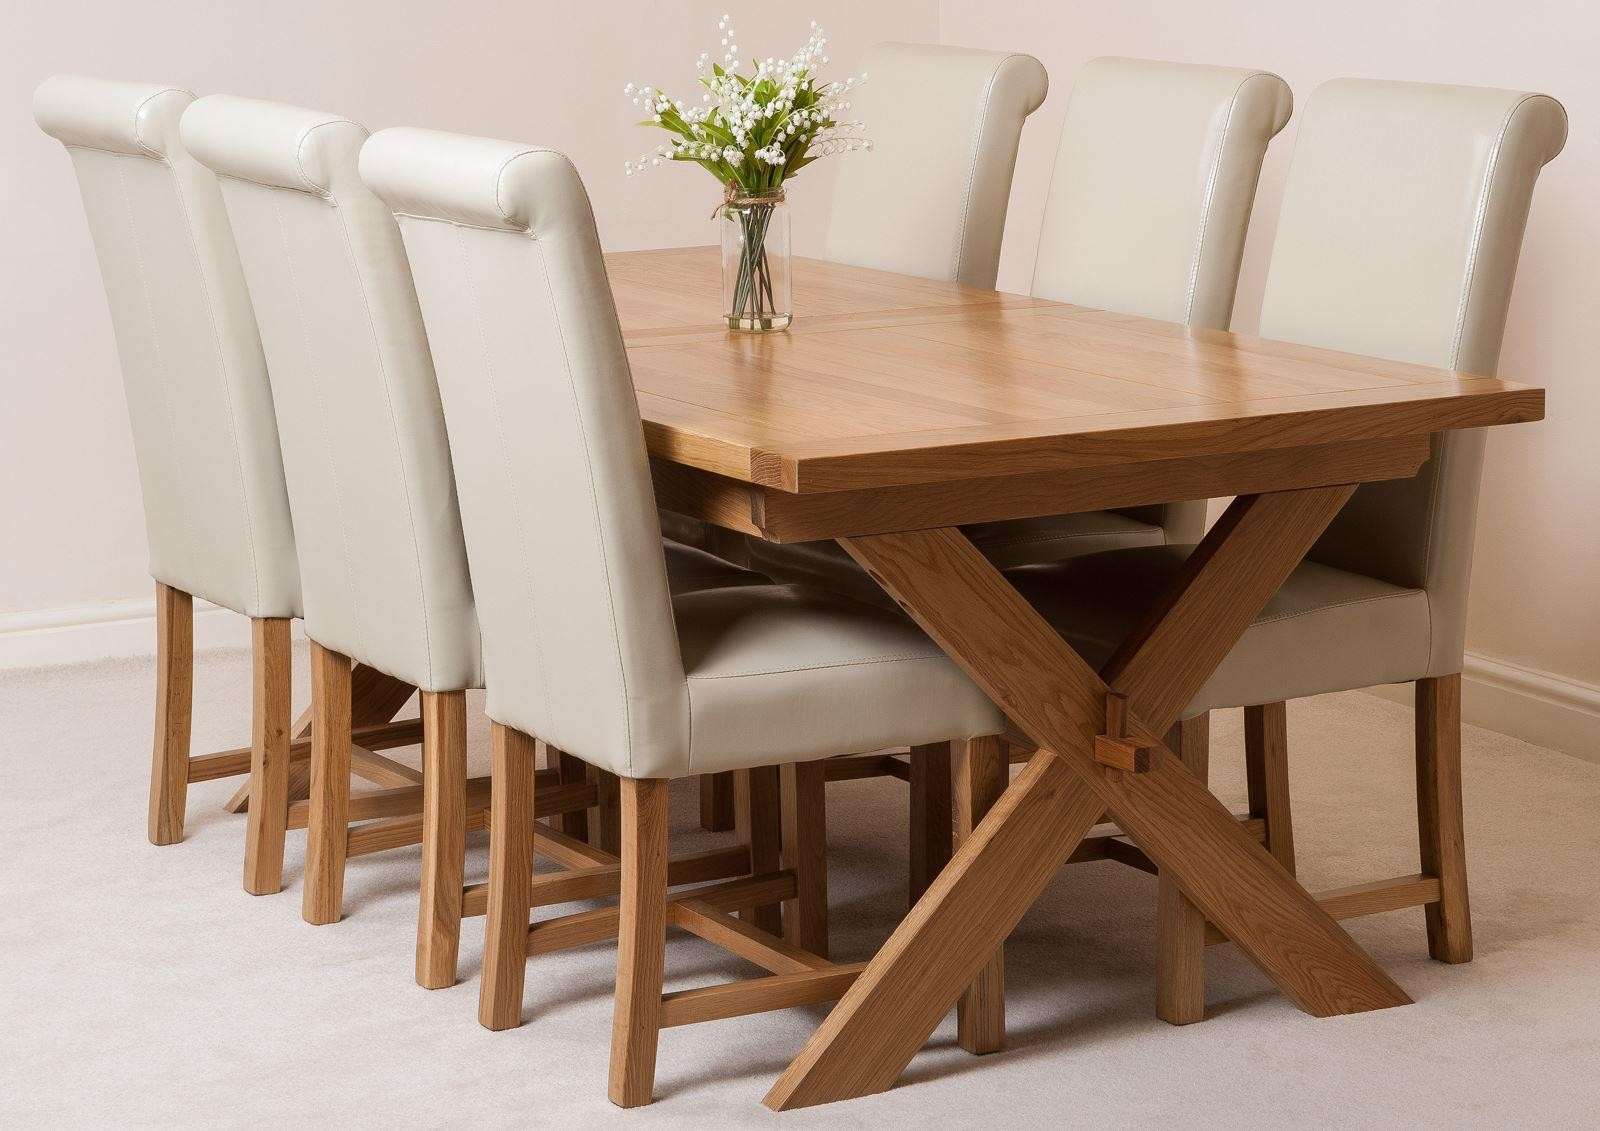 Oak Dining Chairs Design Ideas